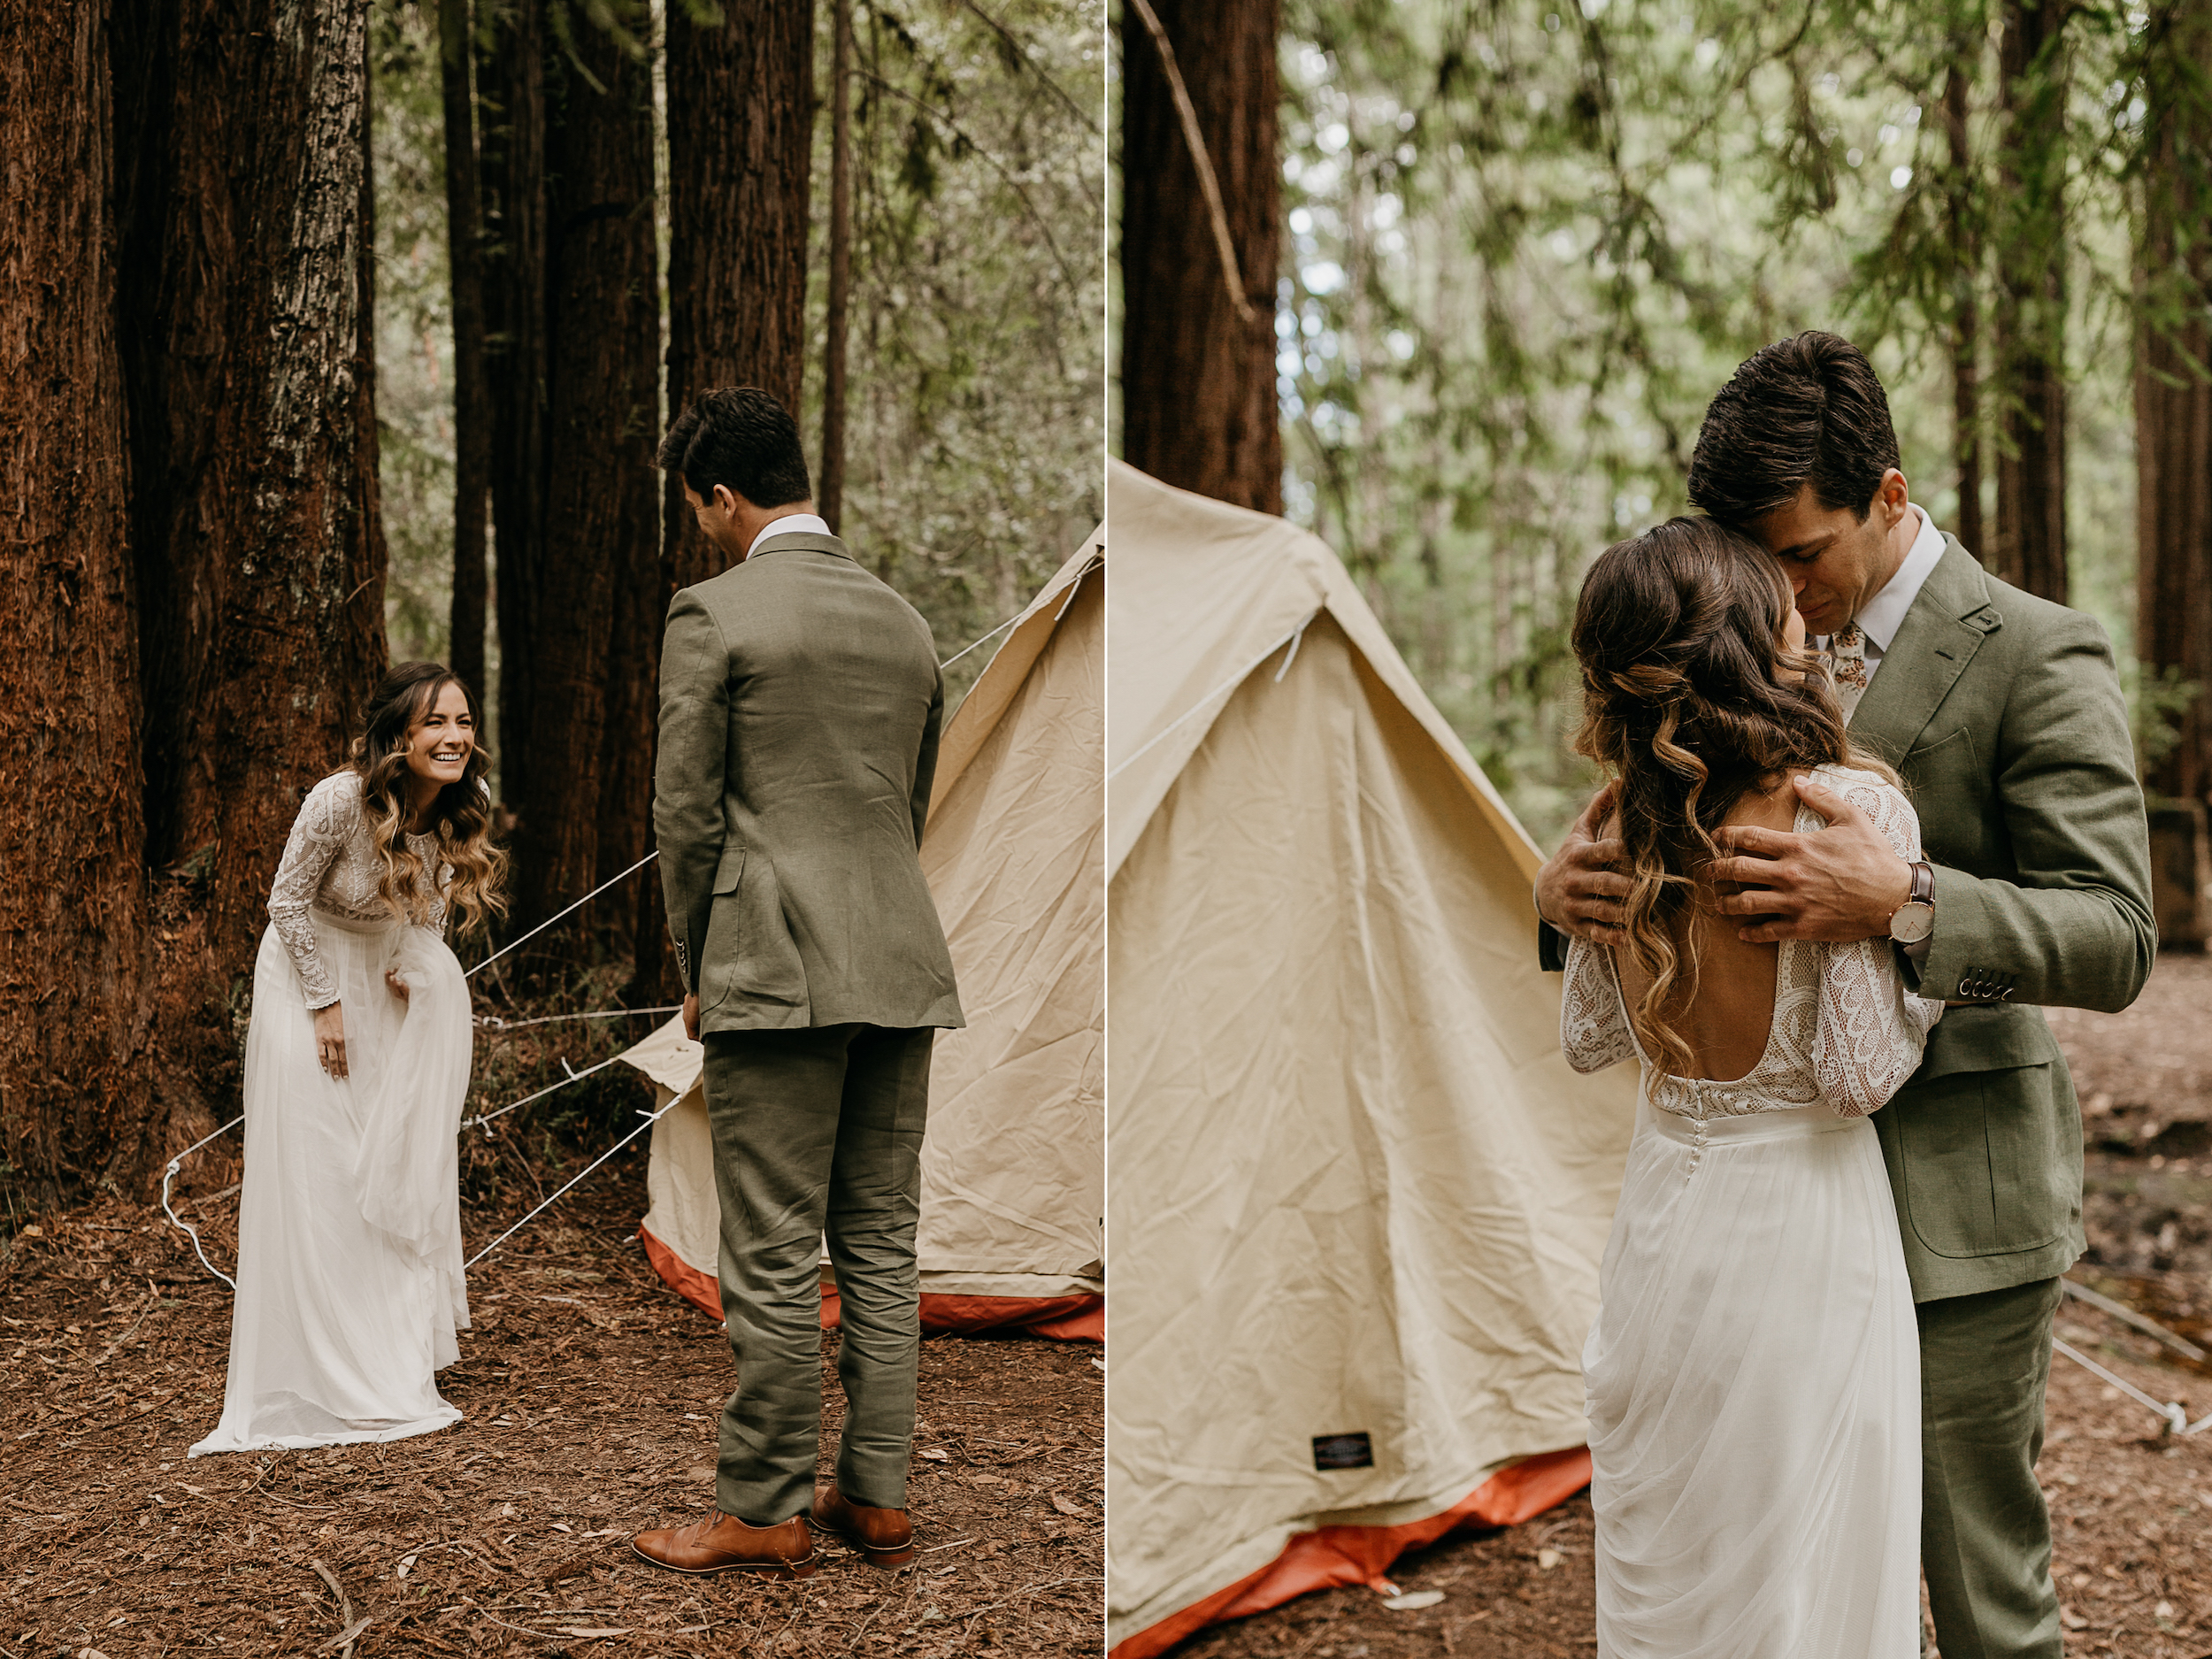 camp campbell-wedding-photographer09.jpg